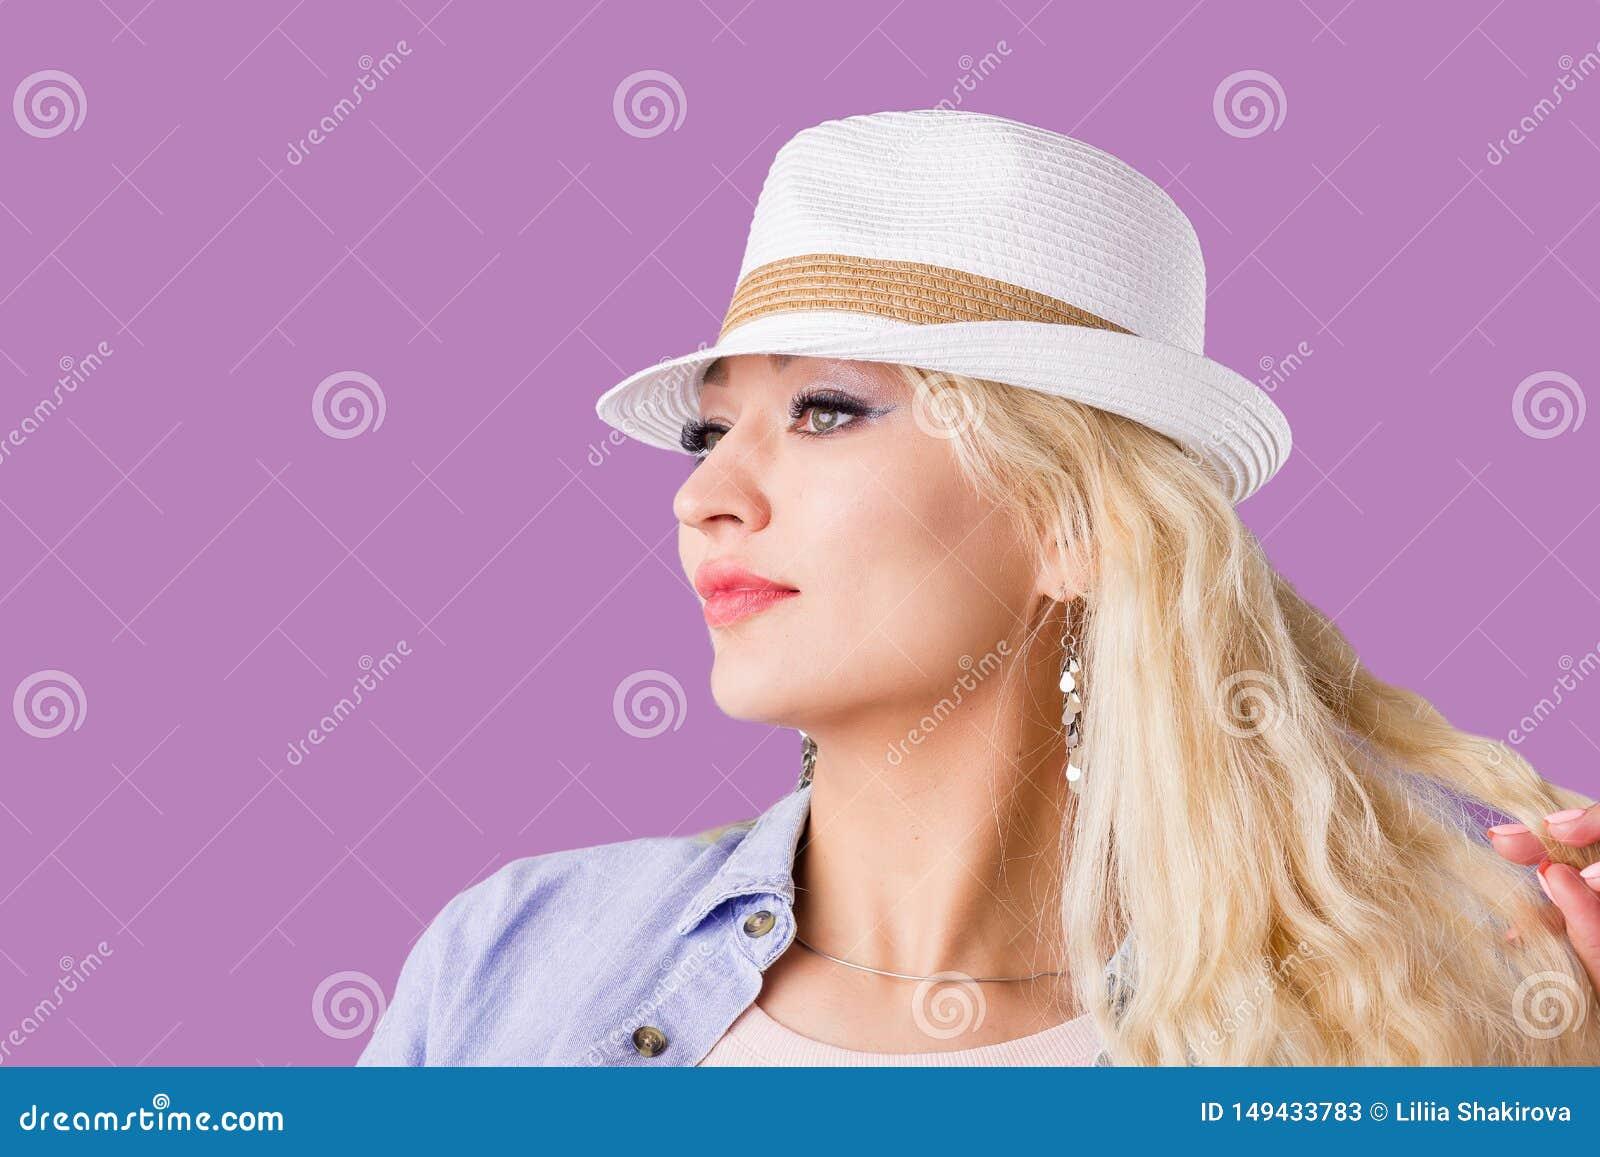 Blonde hat straw woman